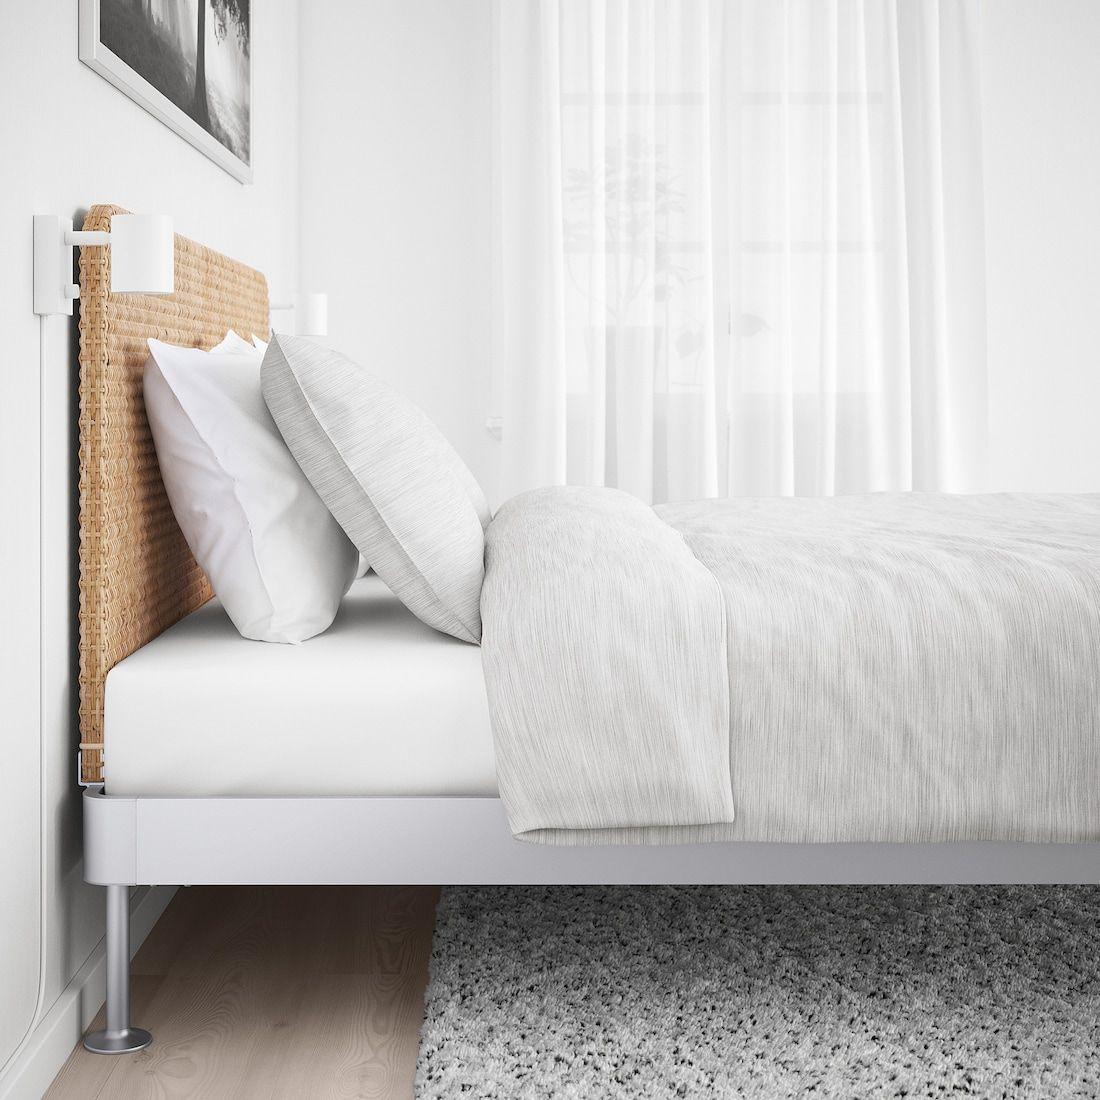 Delaktig Bedframe Met Hoofdeinde Aluminium Rotan Ikea Bed